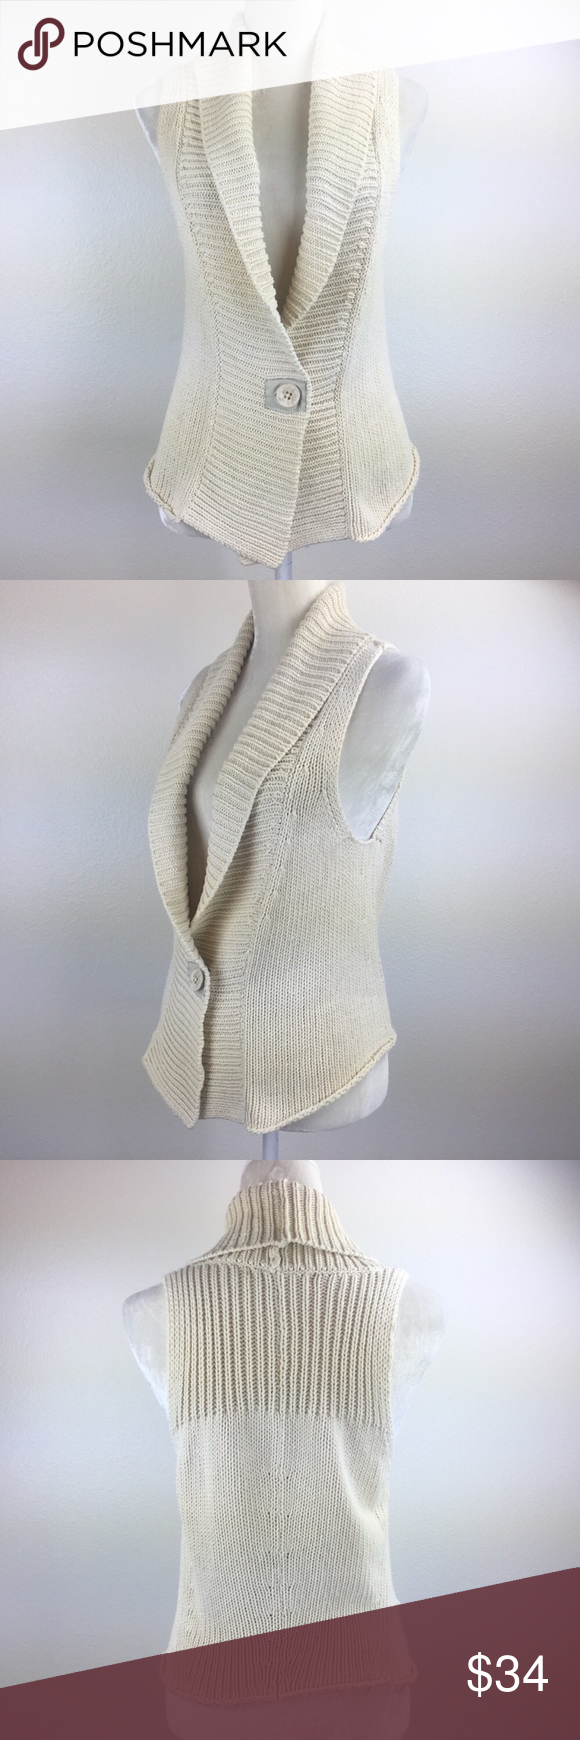 Cabi Cream Cabled Button Close Sleeveless Cardigan Sleeveless Cardigan Sweater Vest Knitted Sweaters